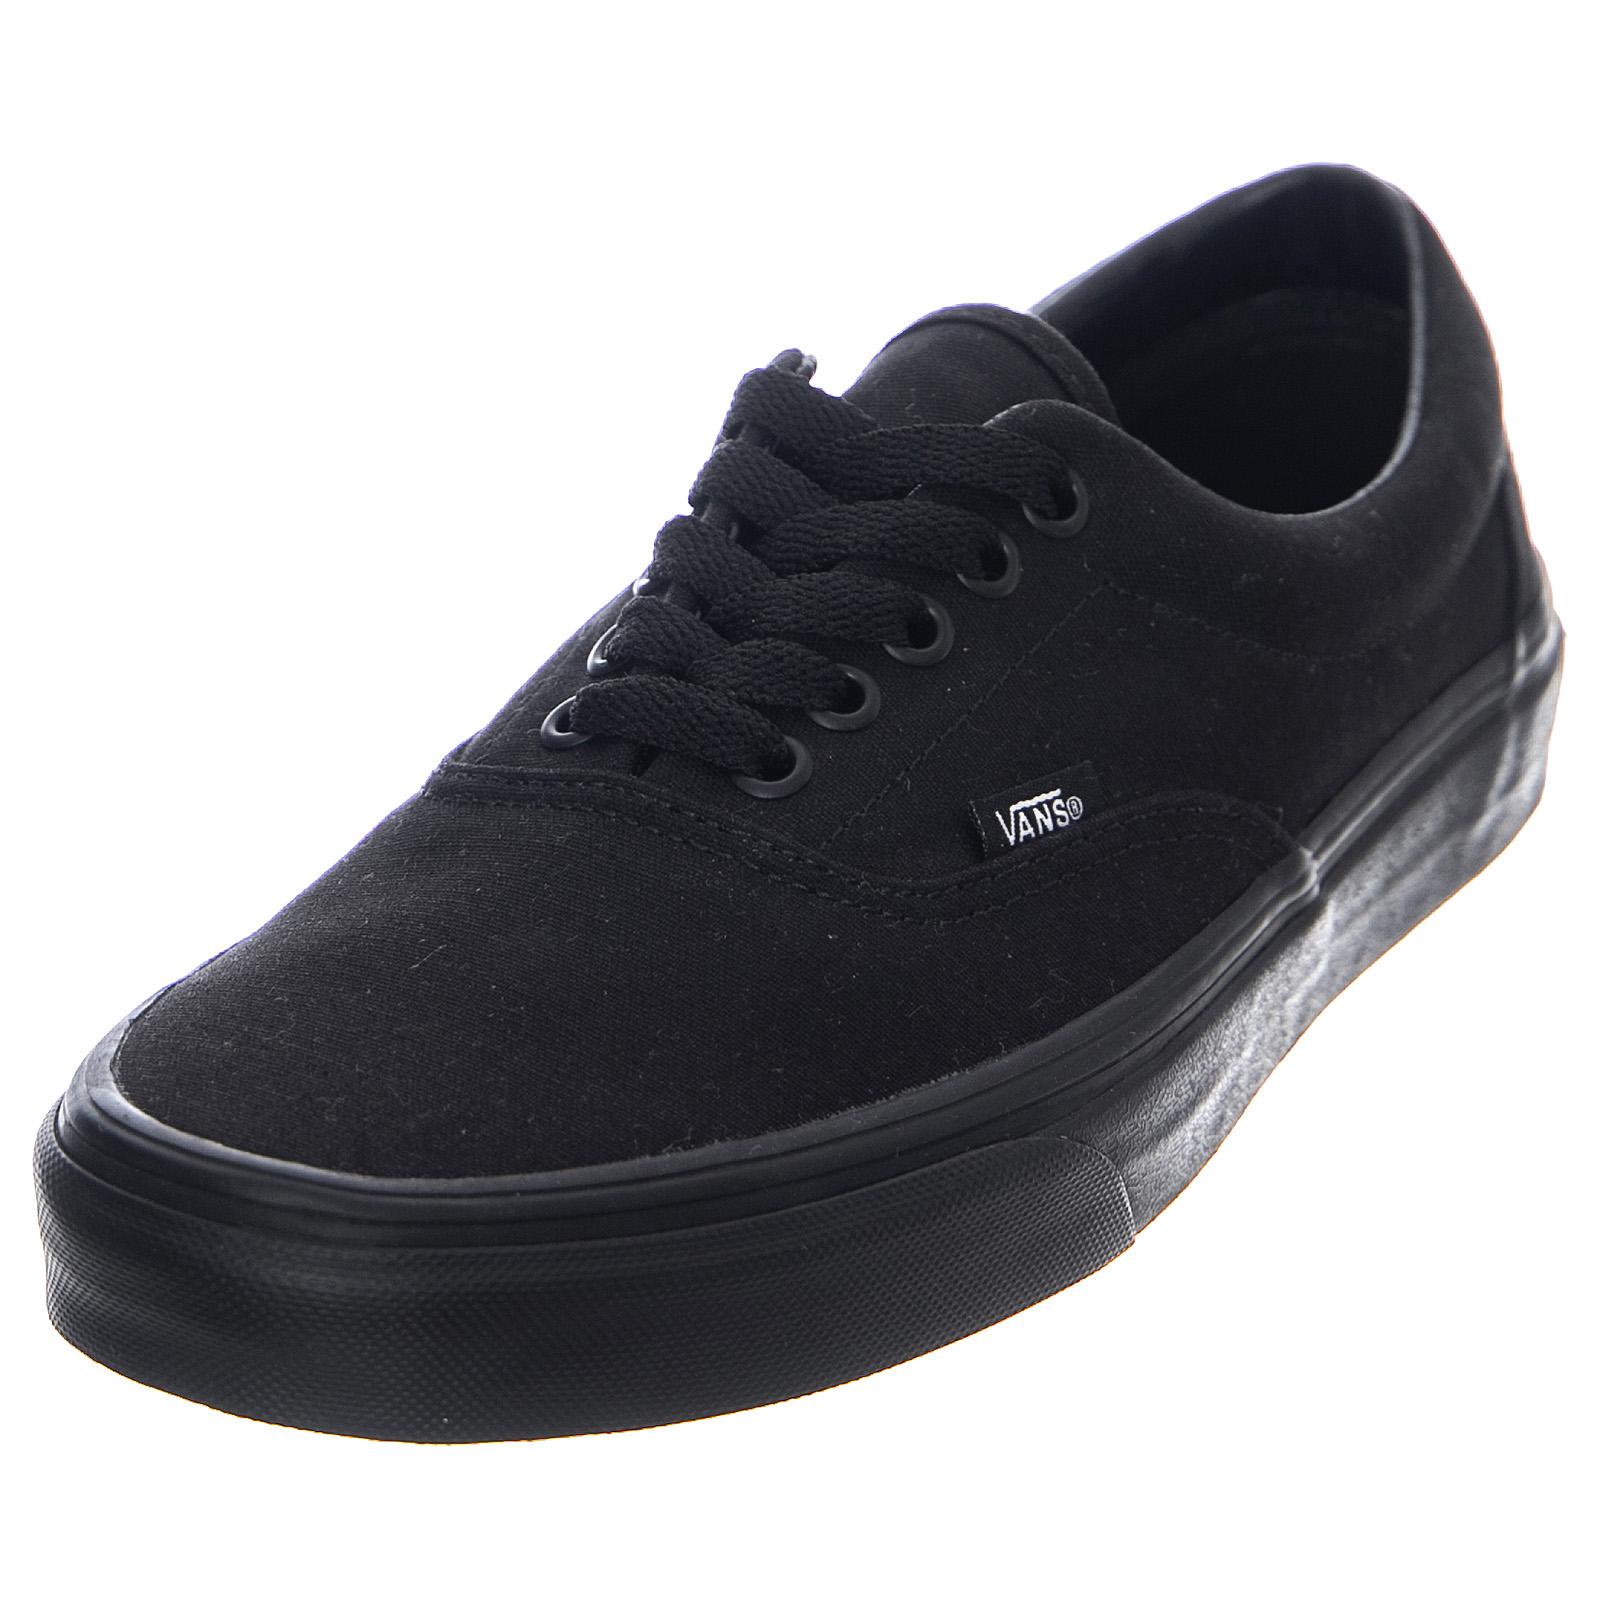 VANS Ua Era Baskets Black Chaussures Basses HommeFemme